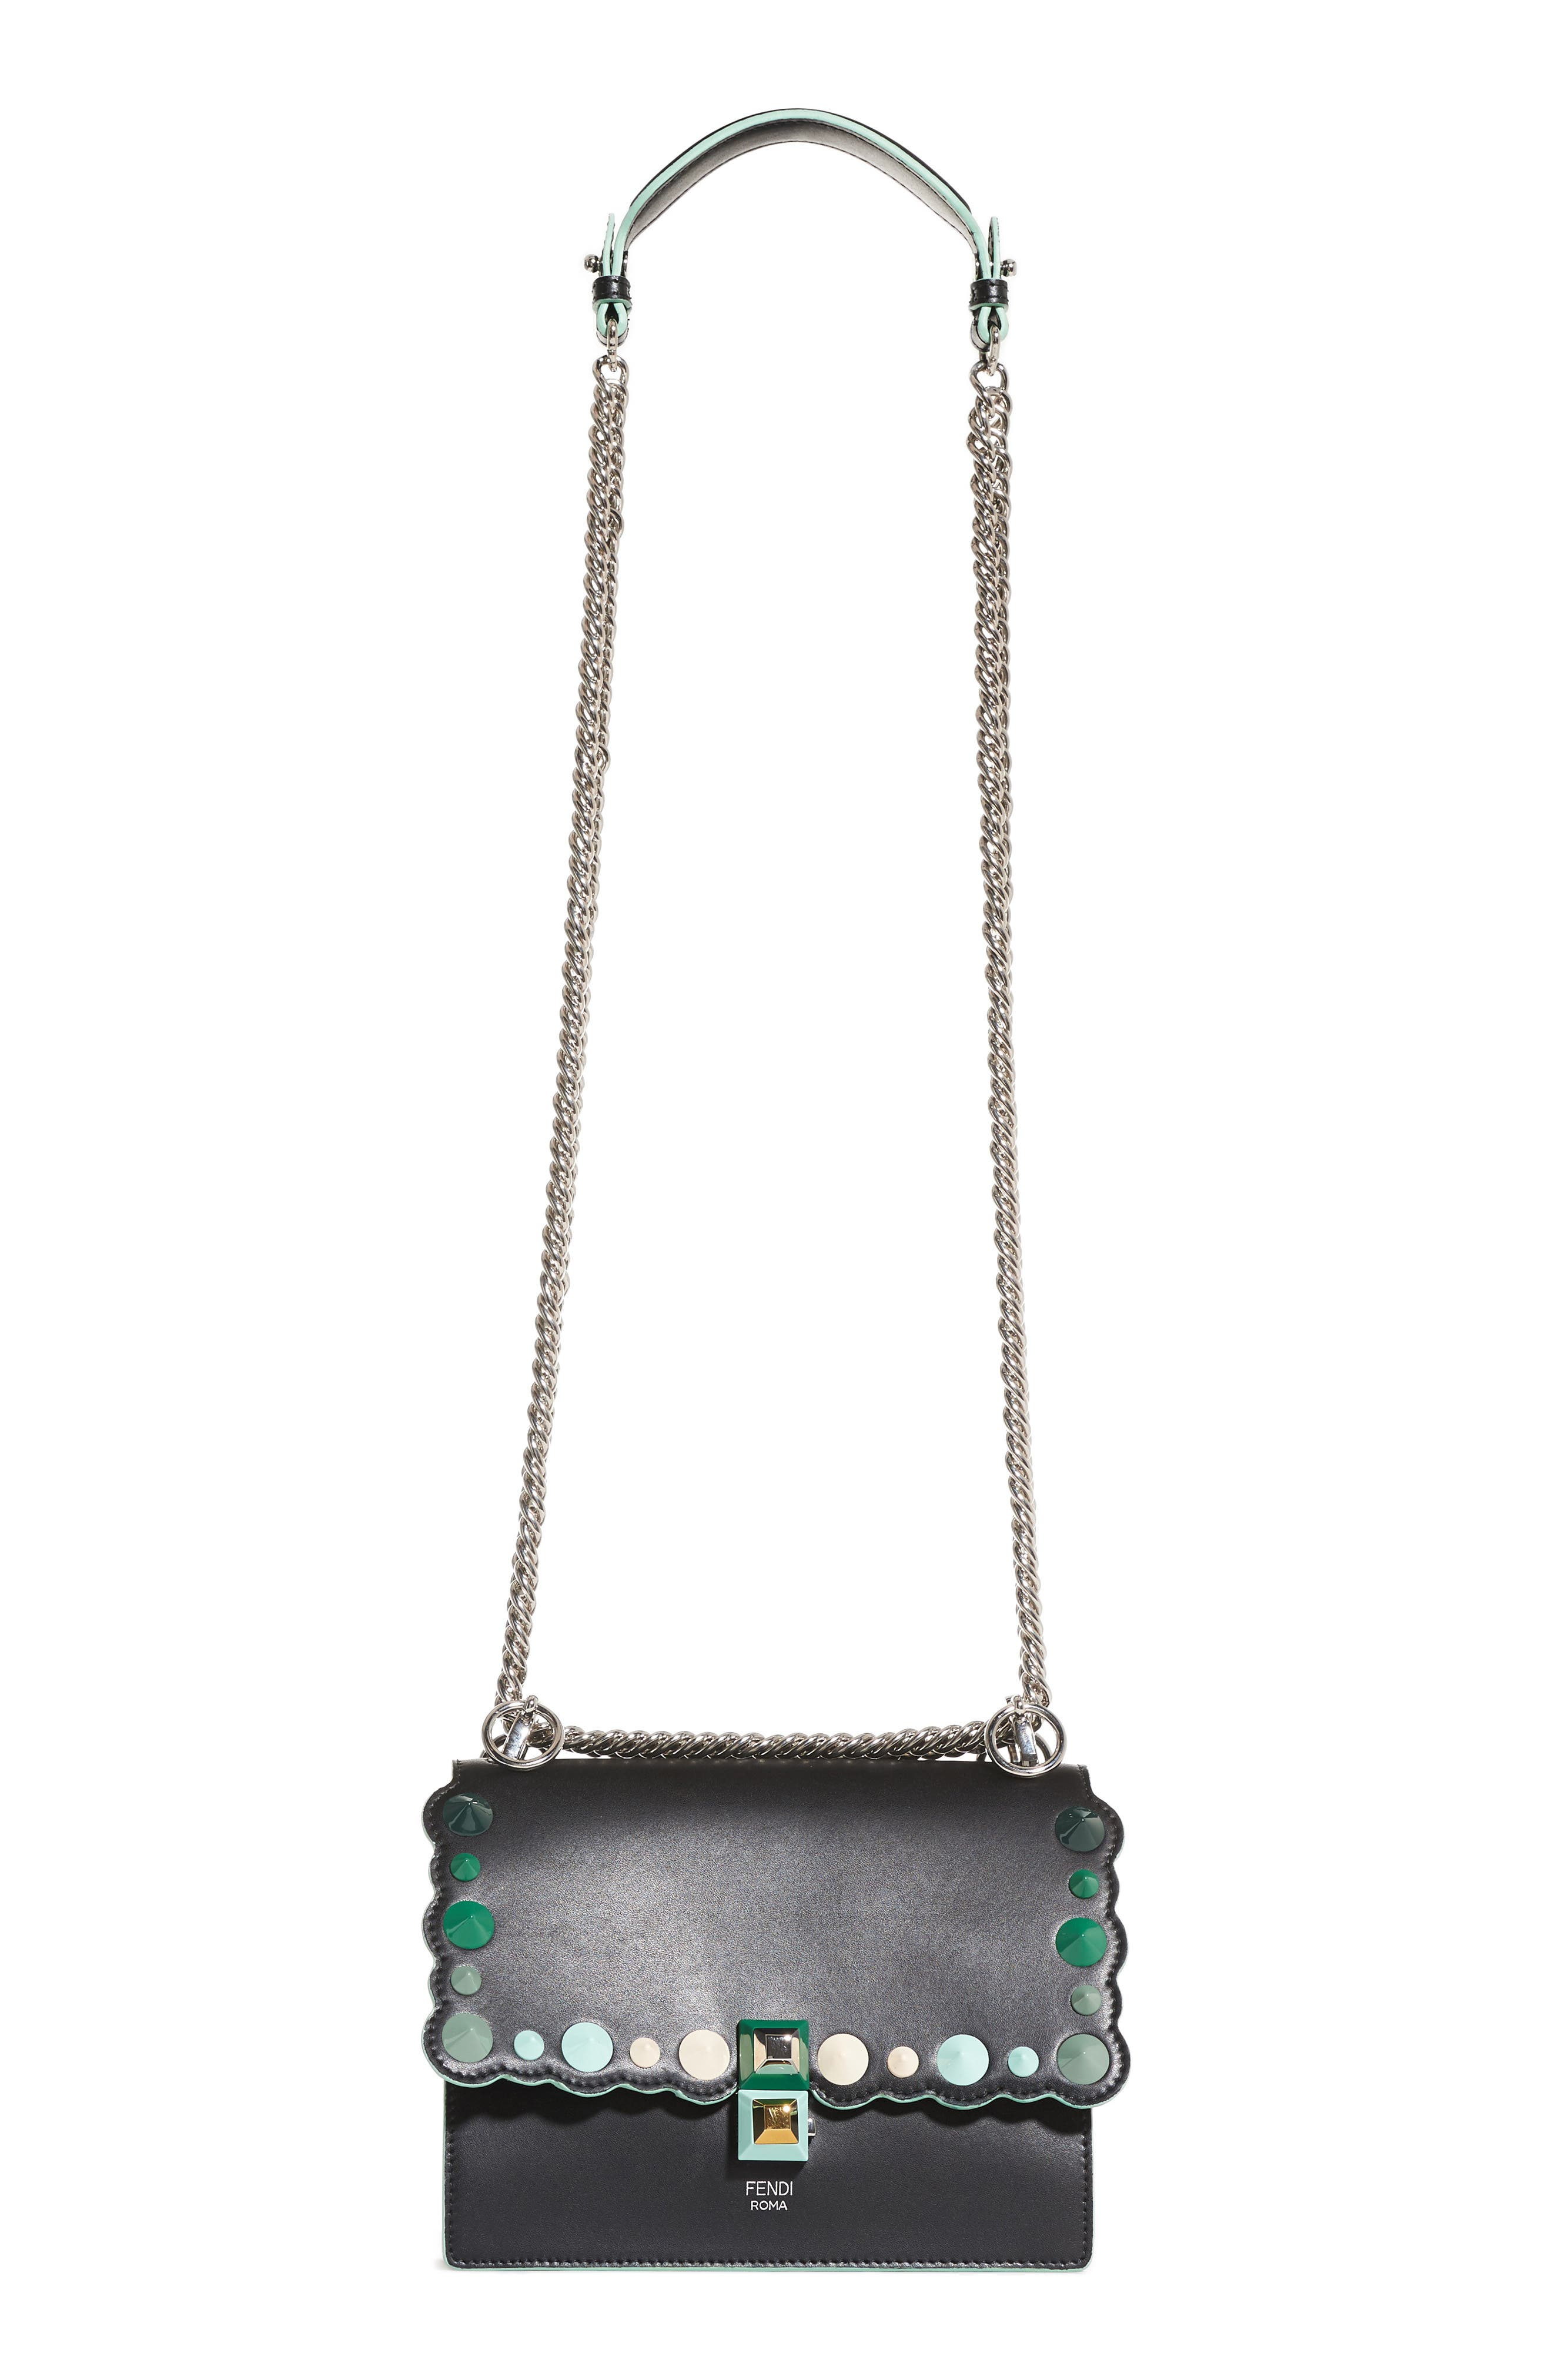 FENDI Mini Kan I Dégradé Stud Calfskin Shoulder Bag